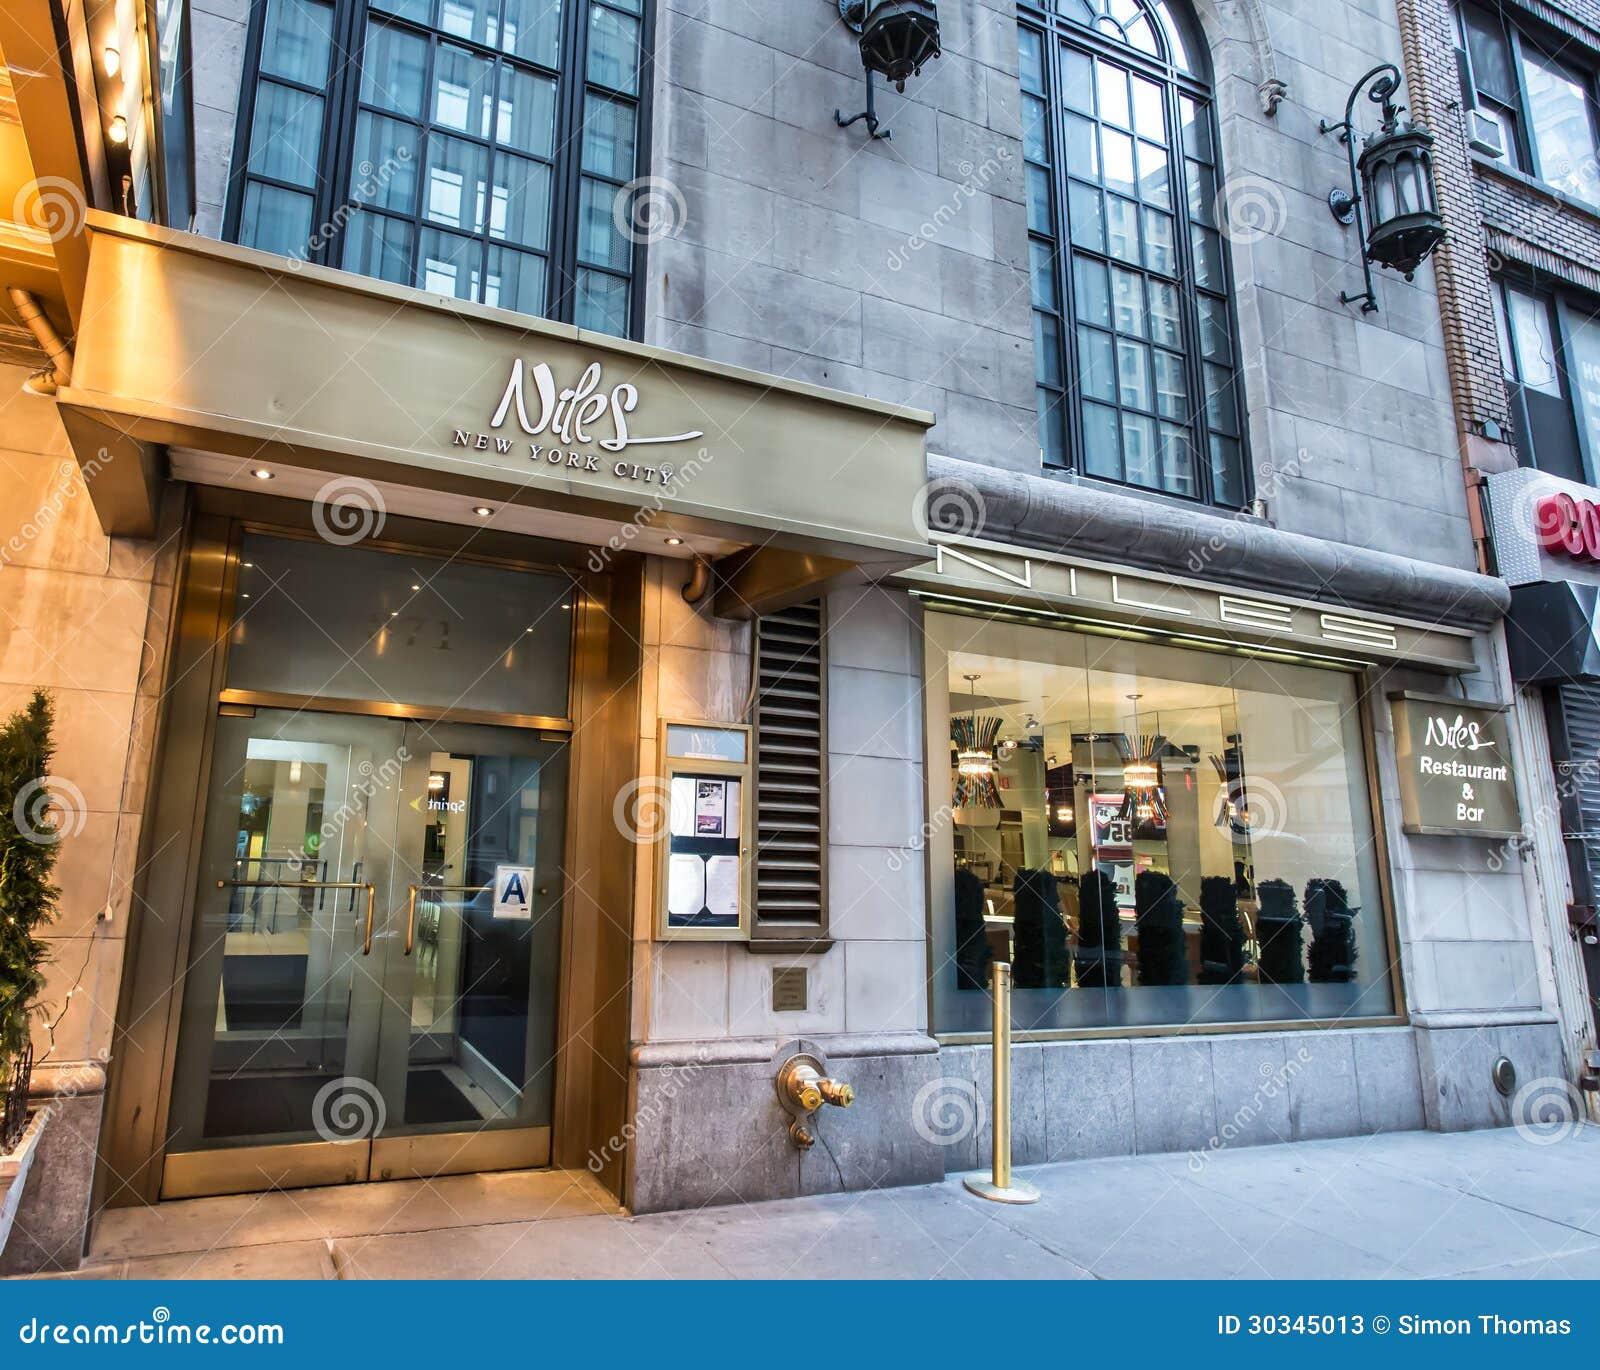 New York New York City: Niles Restaurant New York City Editorial Stock Photo